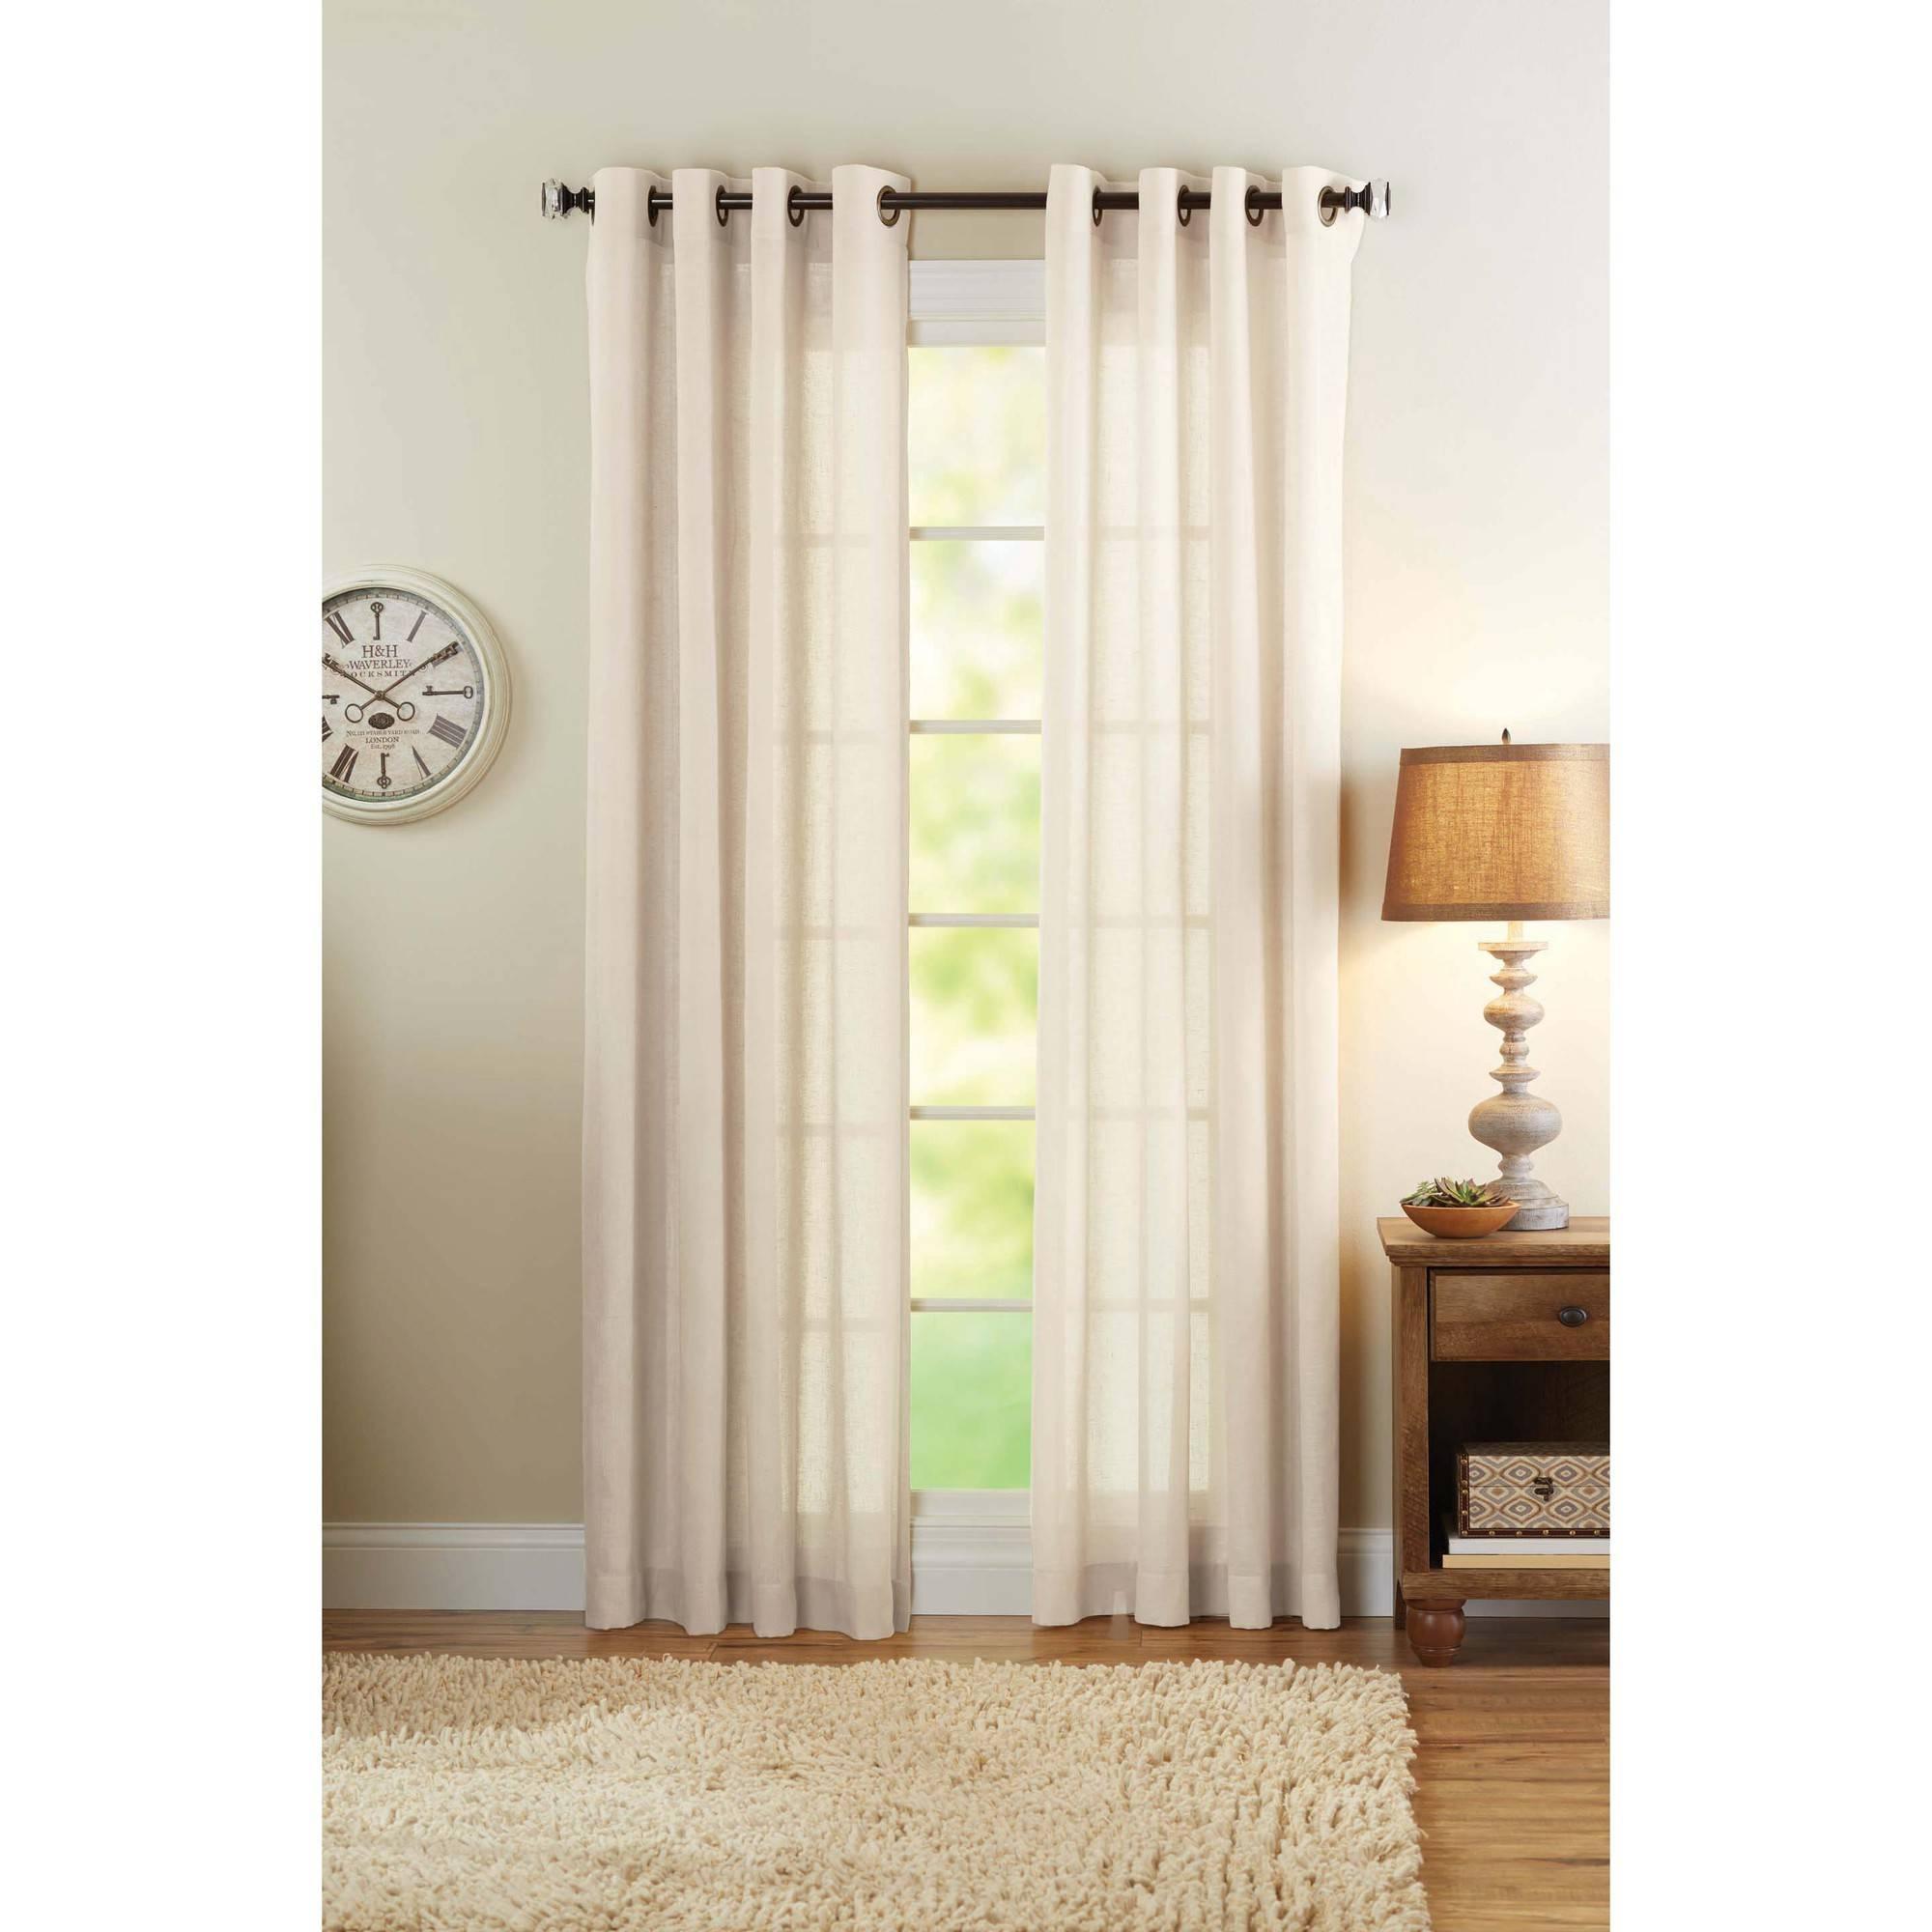 Better Homes And Gardens Semi Sheer Grommet Curtain Panel Regarding Linen Grommet Curtains (Image 3 of 25)